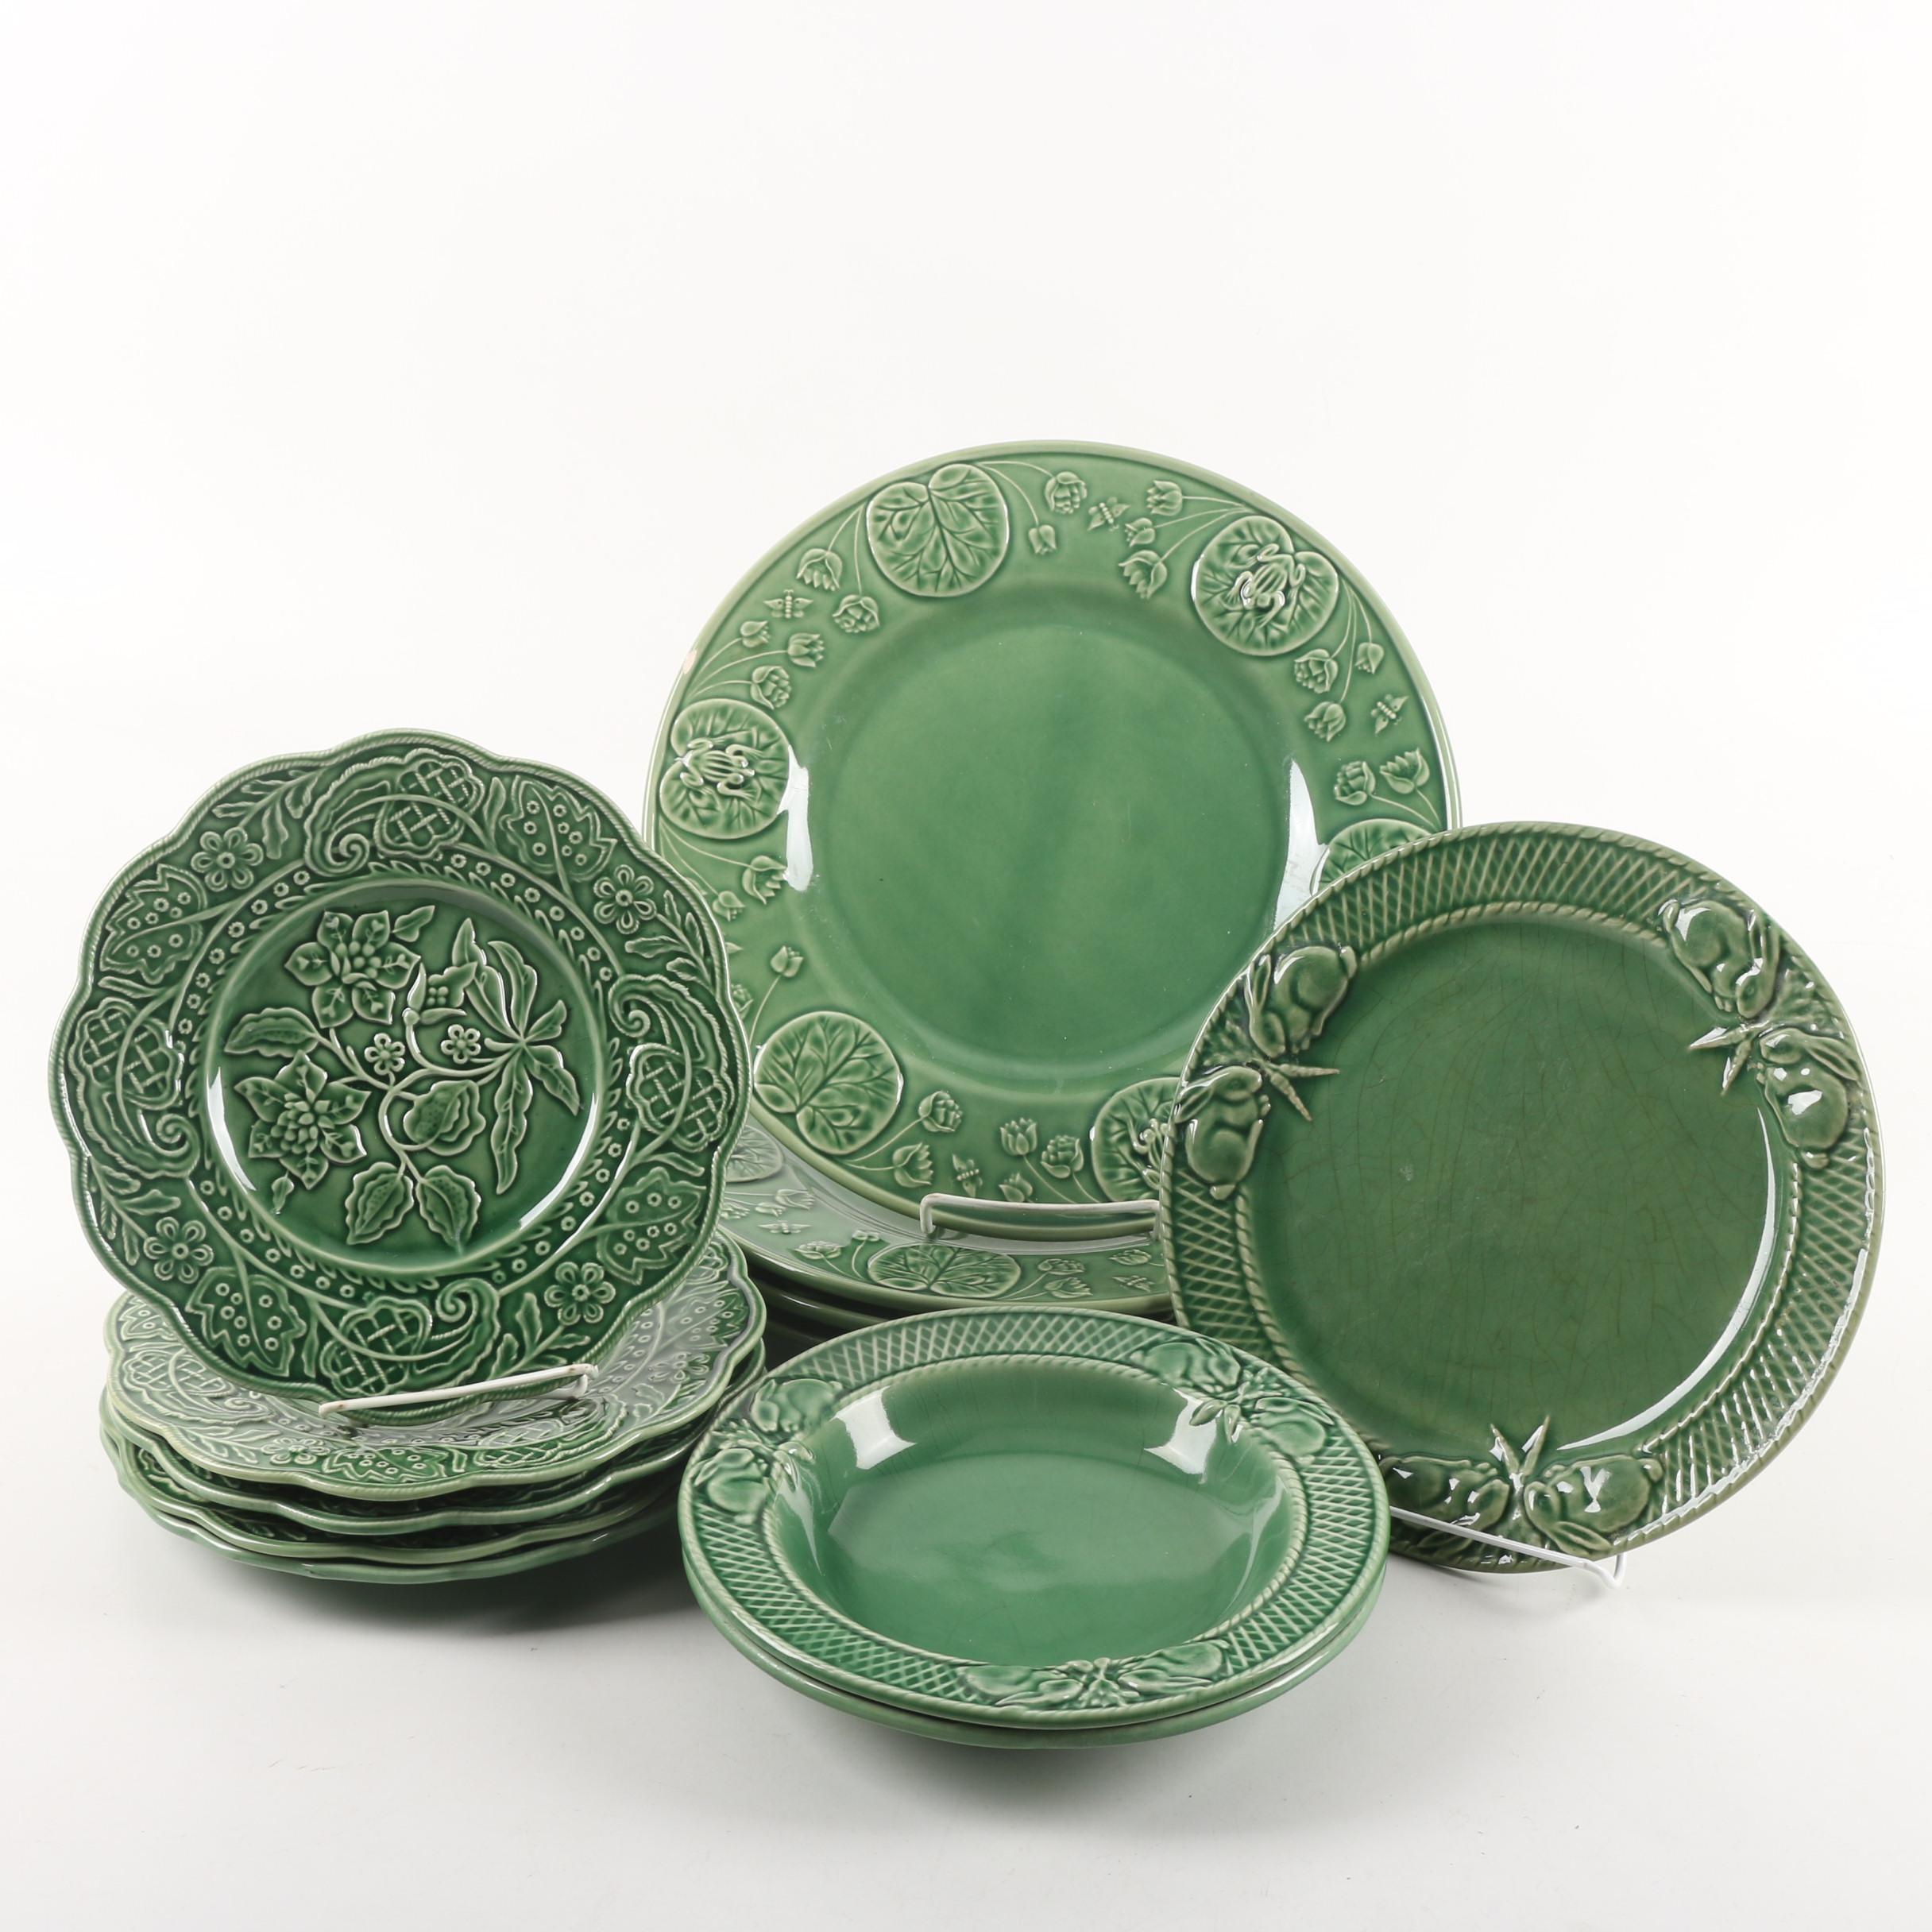 Bordallo Pinheiro Majolica Style Ceramic Tableware